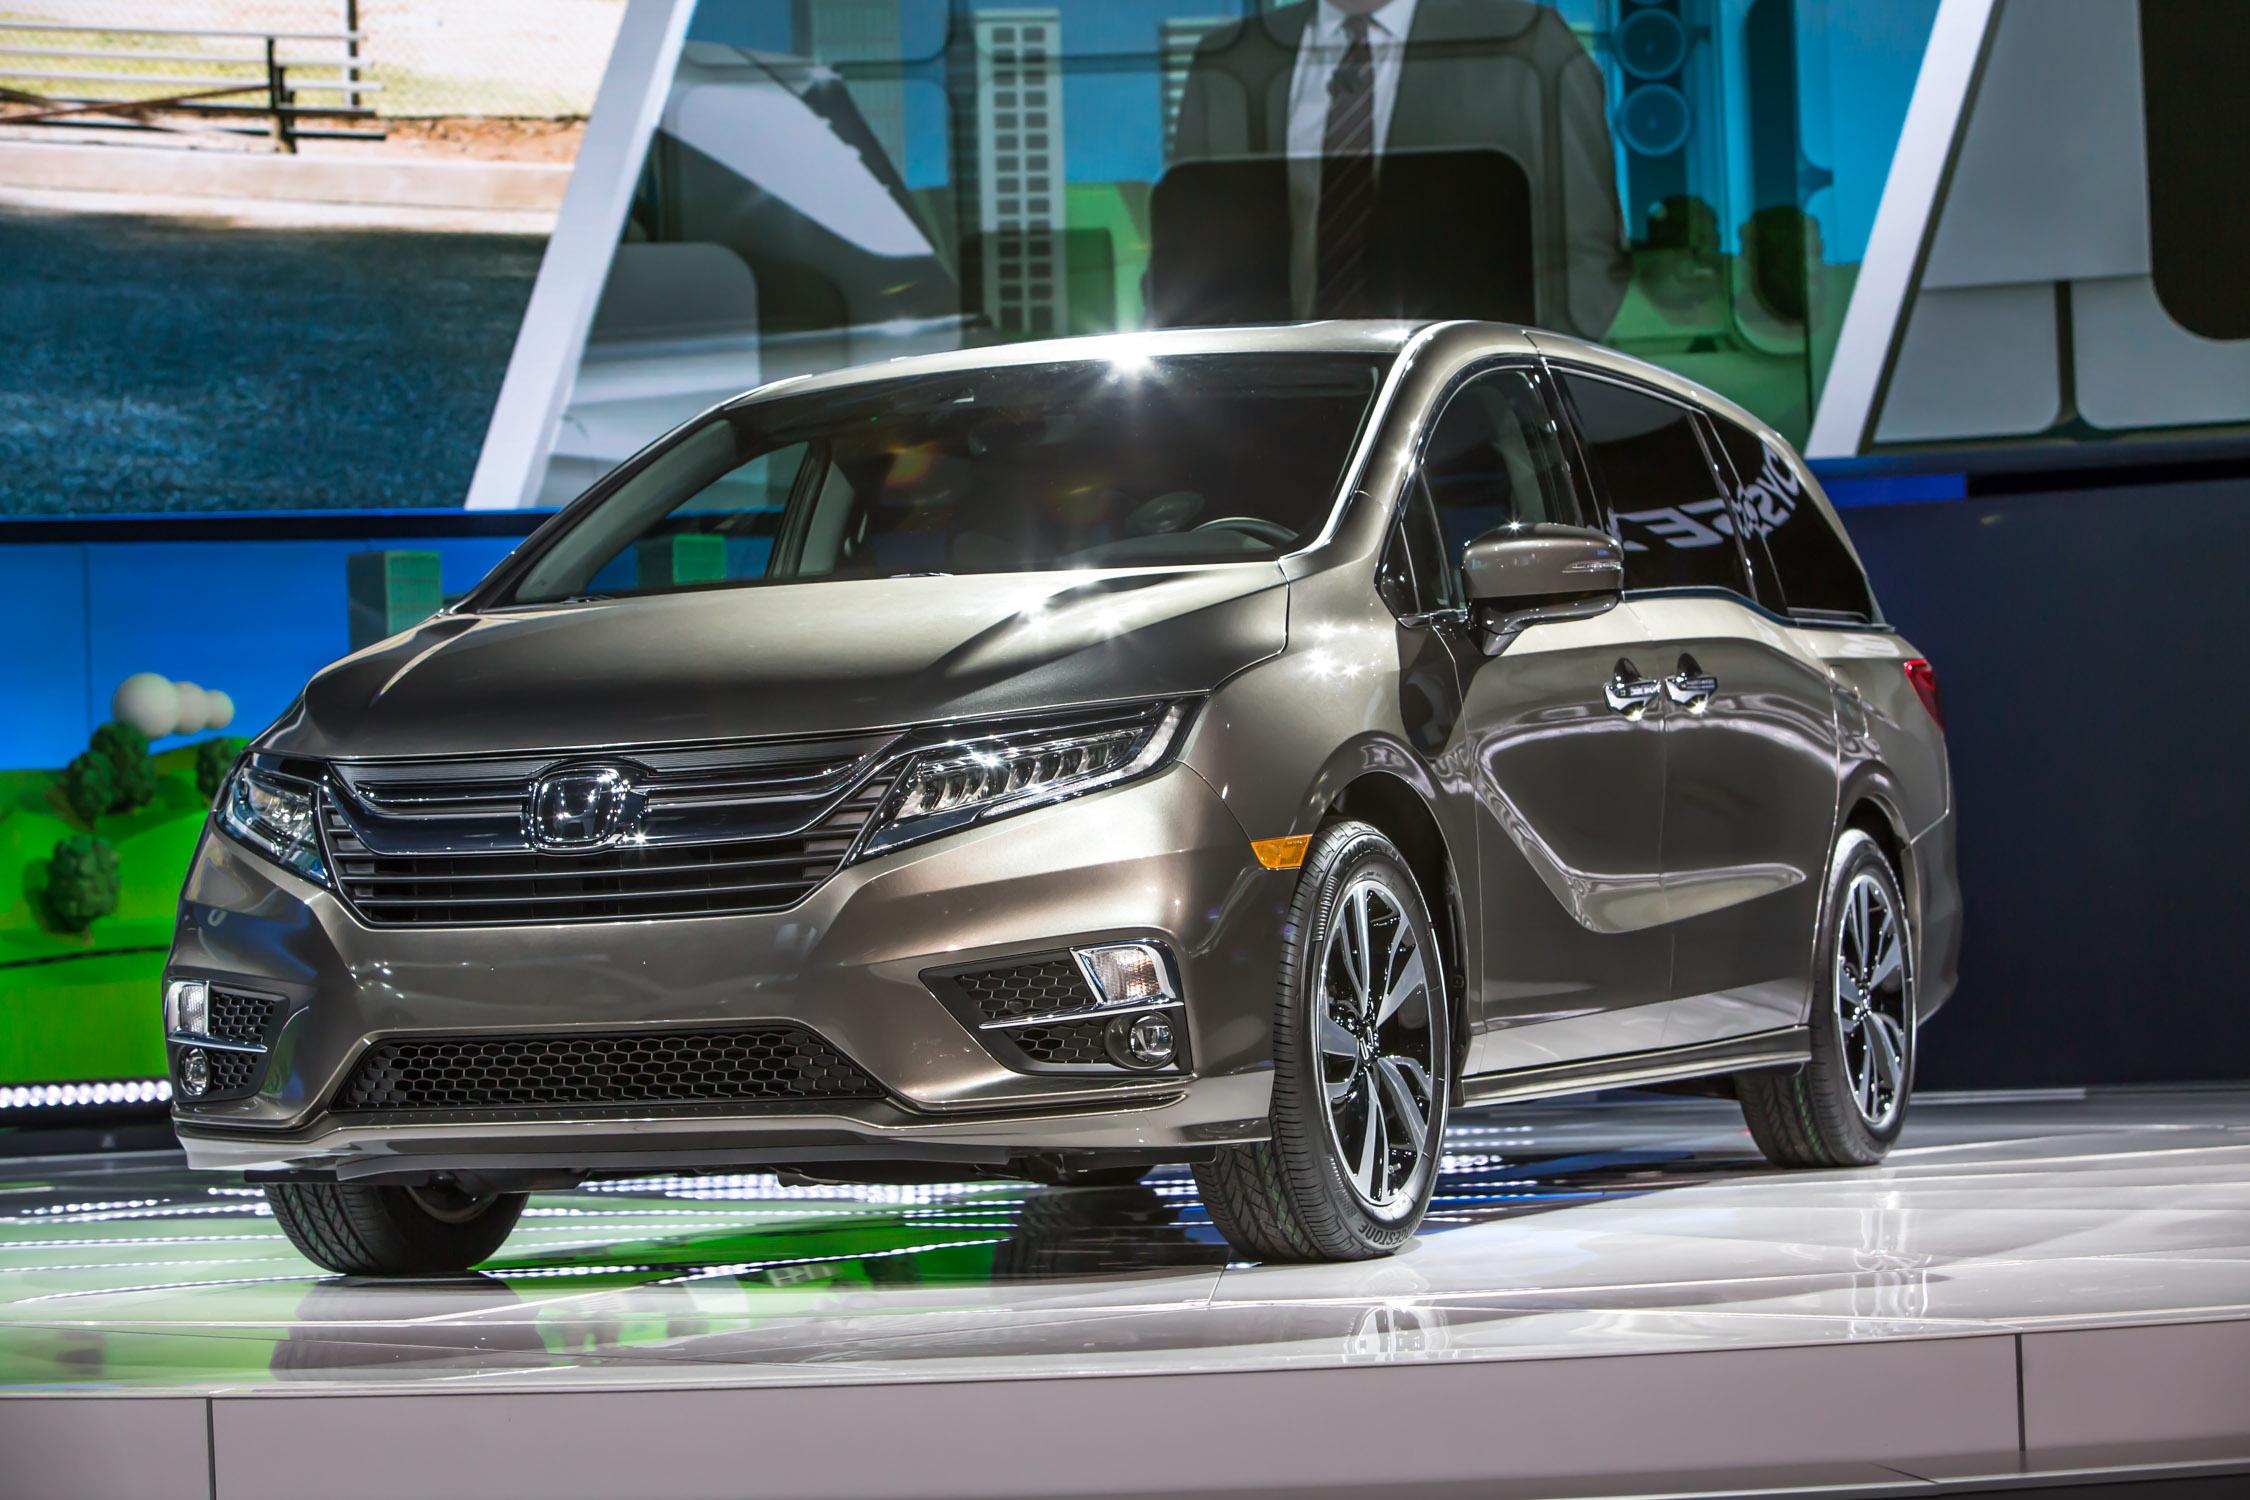 2017 auto show highlights autonxt for Detroit auto show honda odyssey